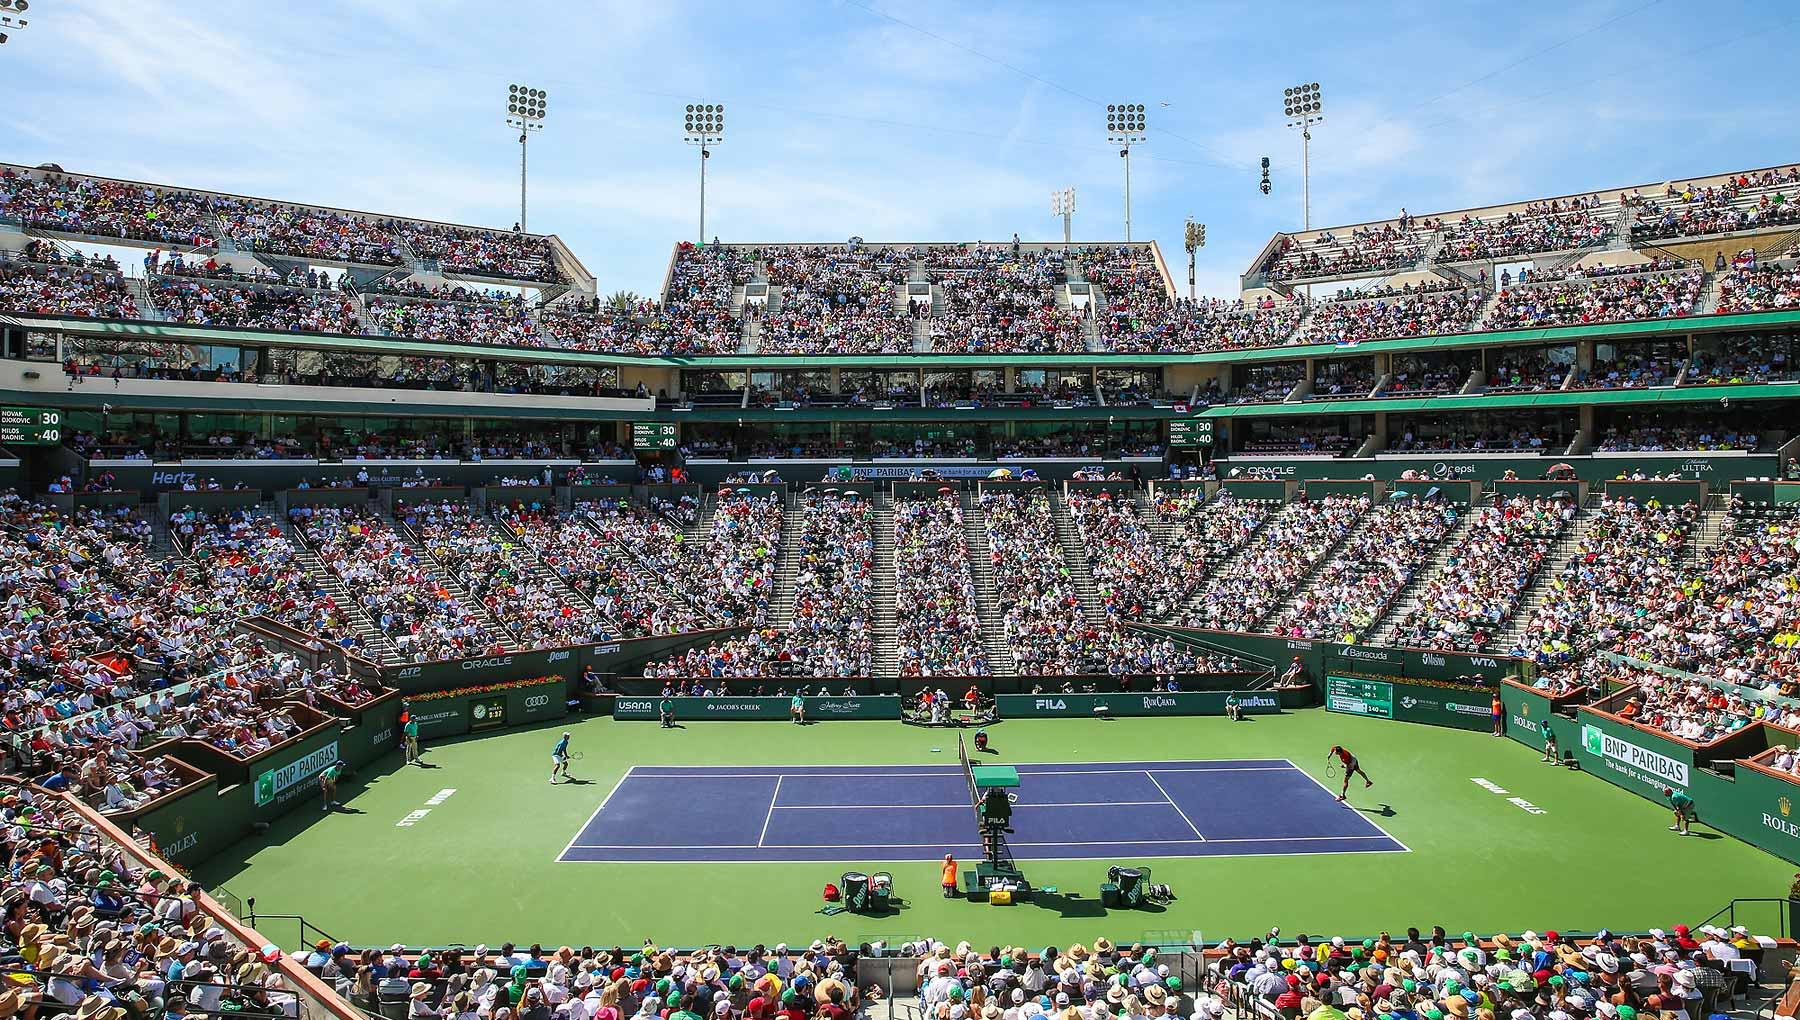 Indian Wells, Acapulco, Stuttgart and Rome receive WTA Tournament awards